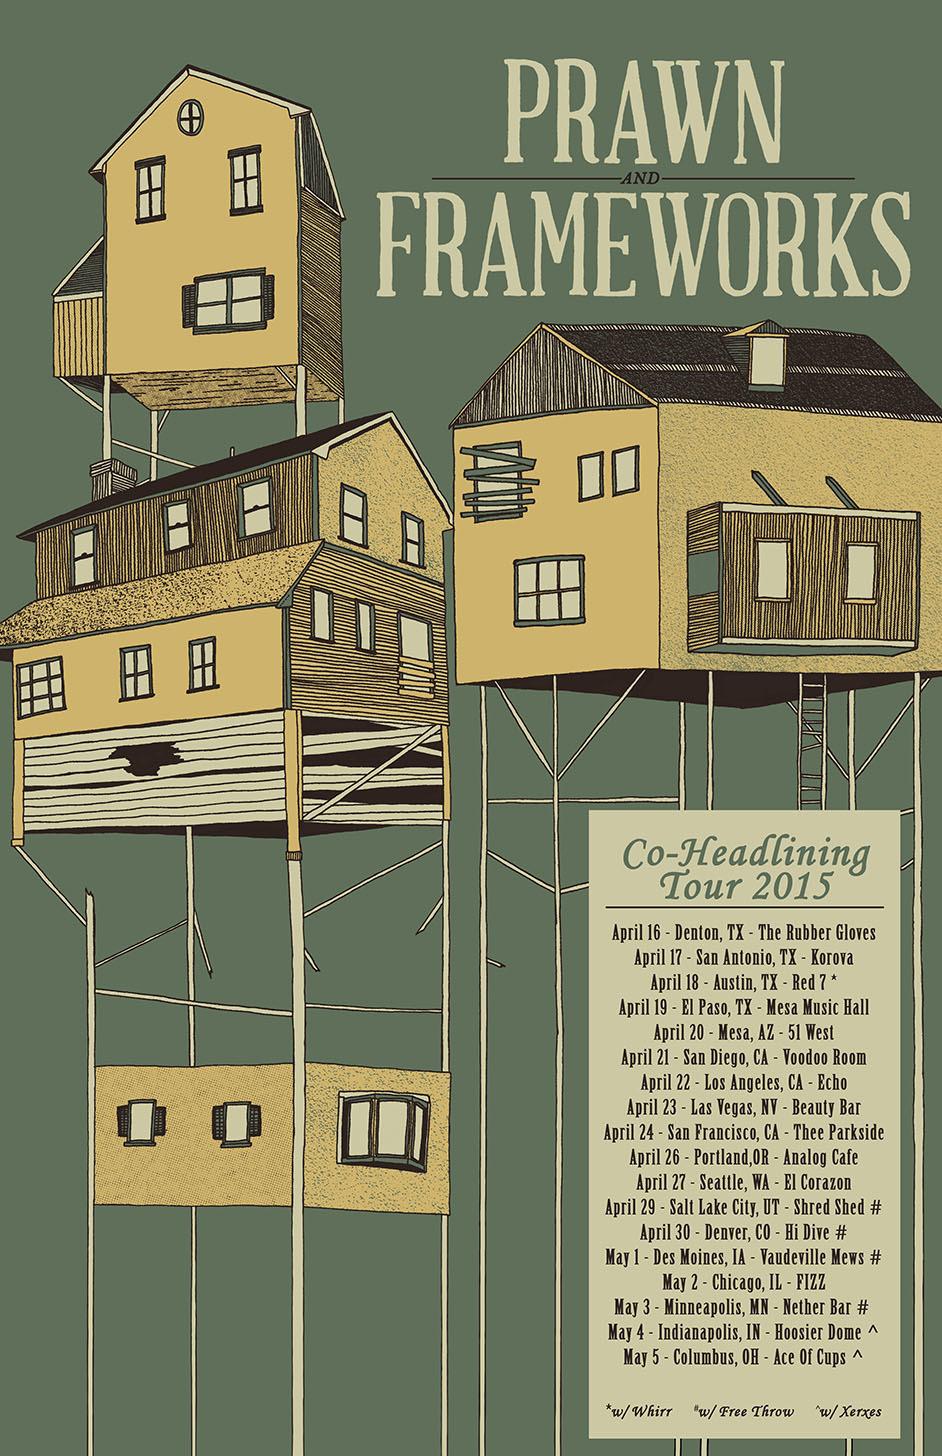 prawn frameworks co headline tour